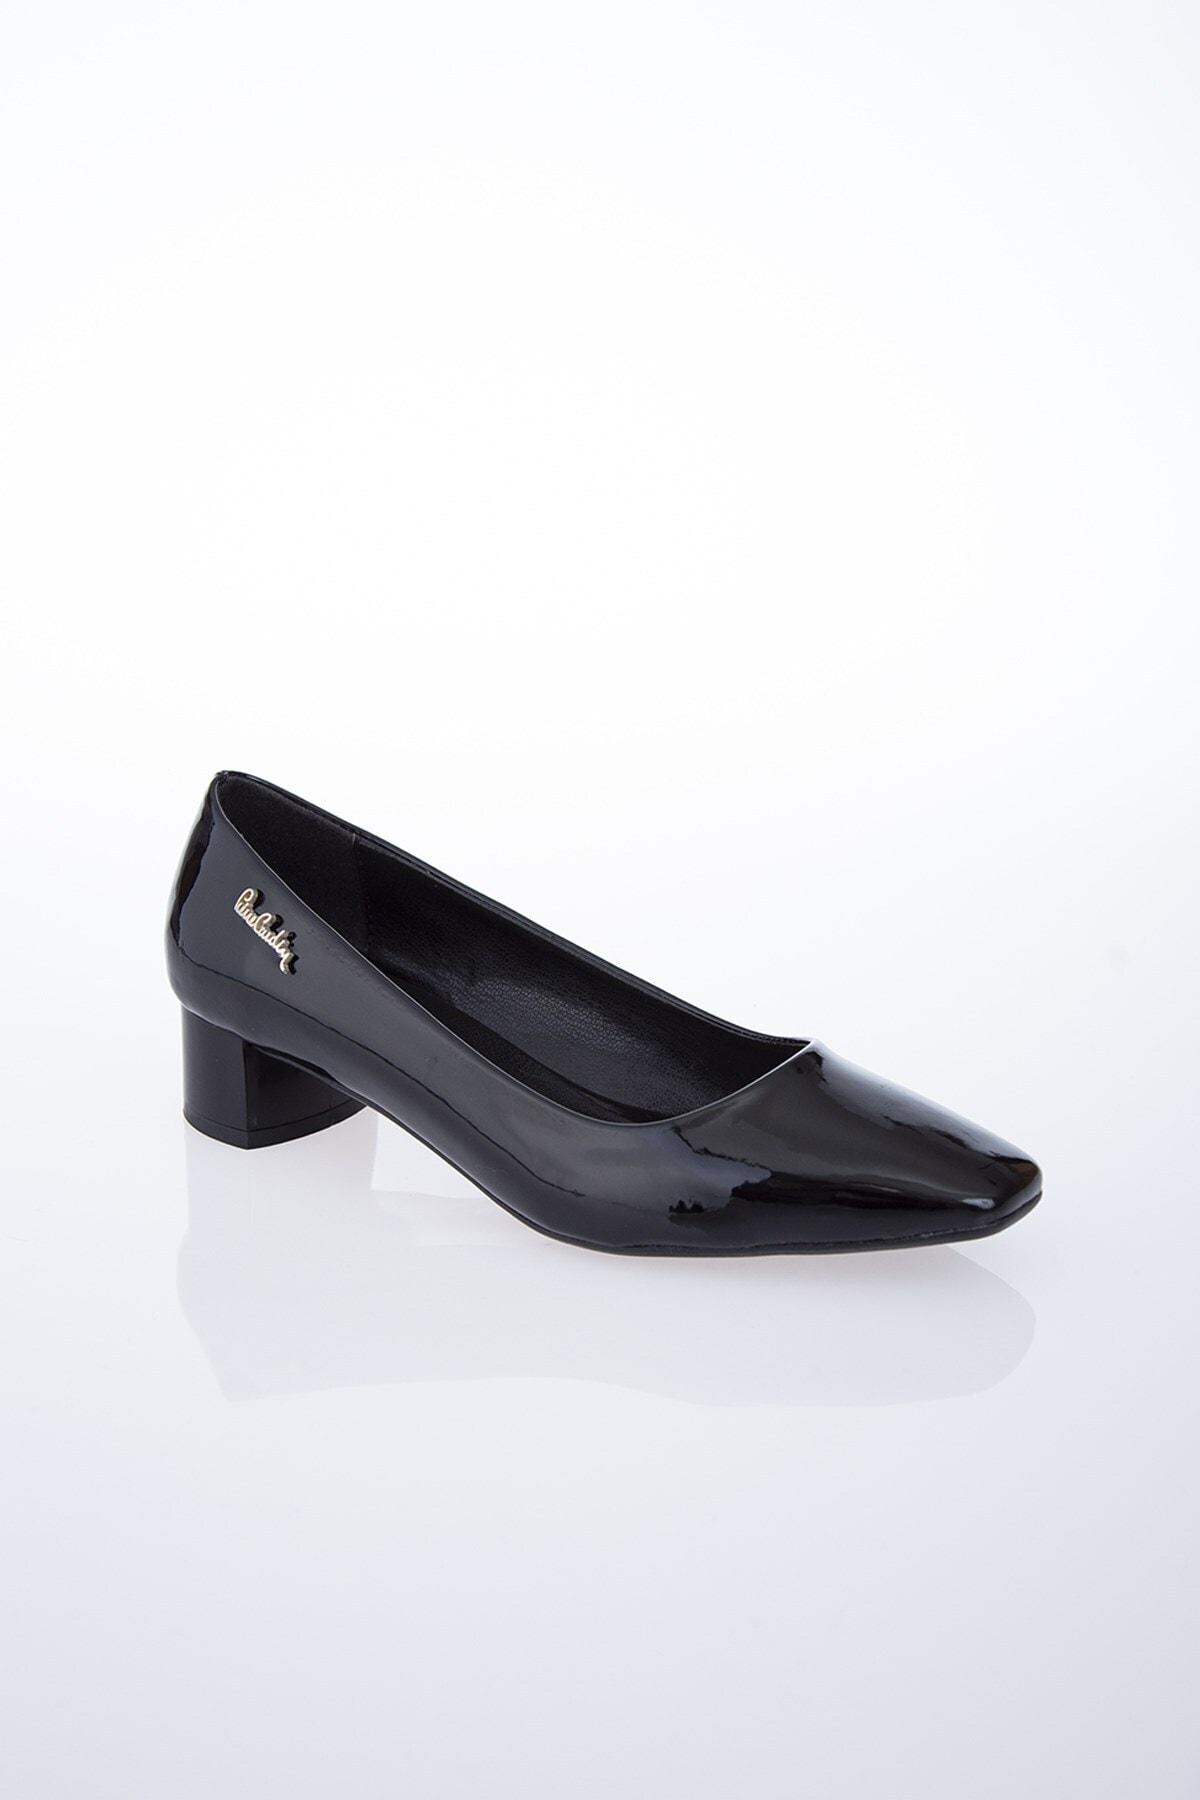 Pierre Cardin Pc-50320-siyah 2